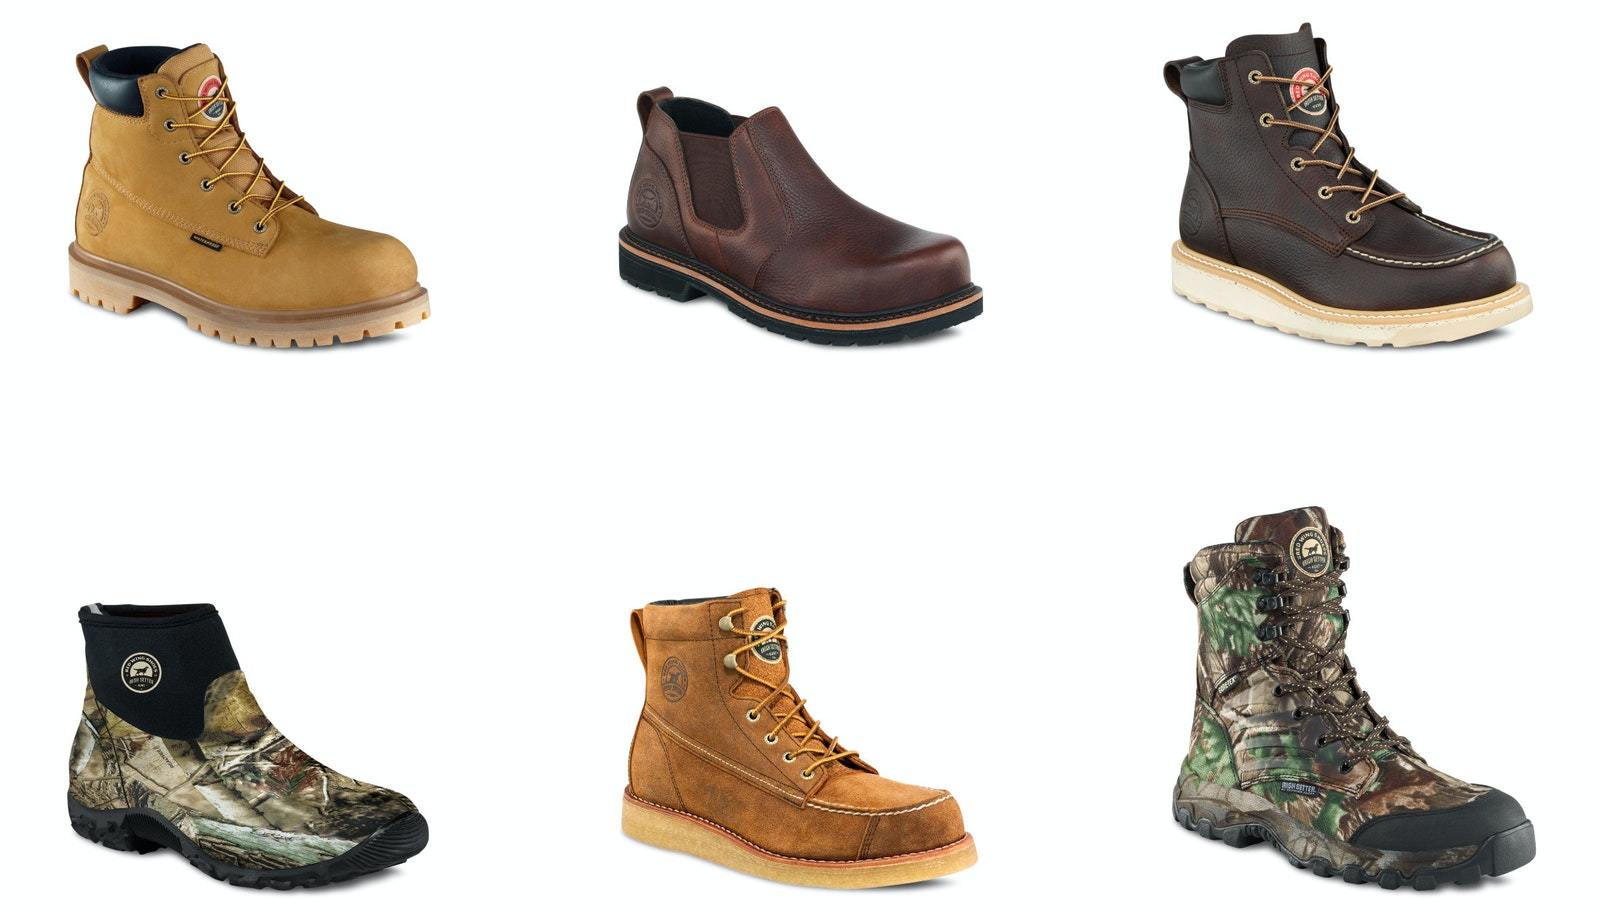 Irishsetter shoes 6